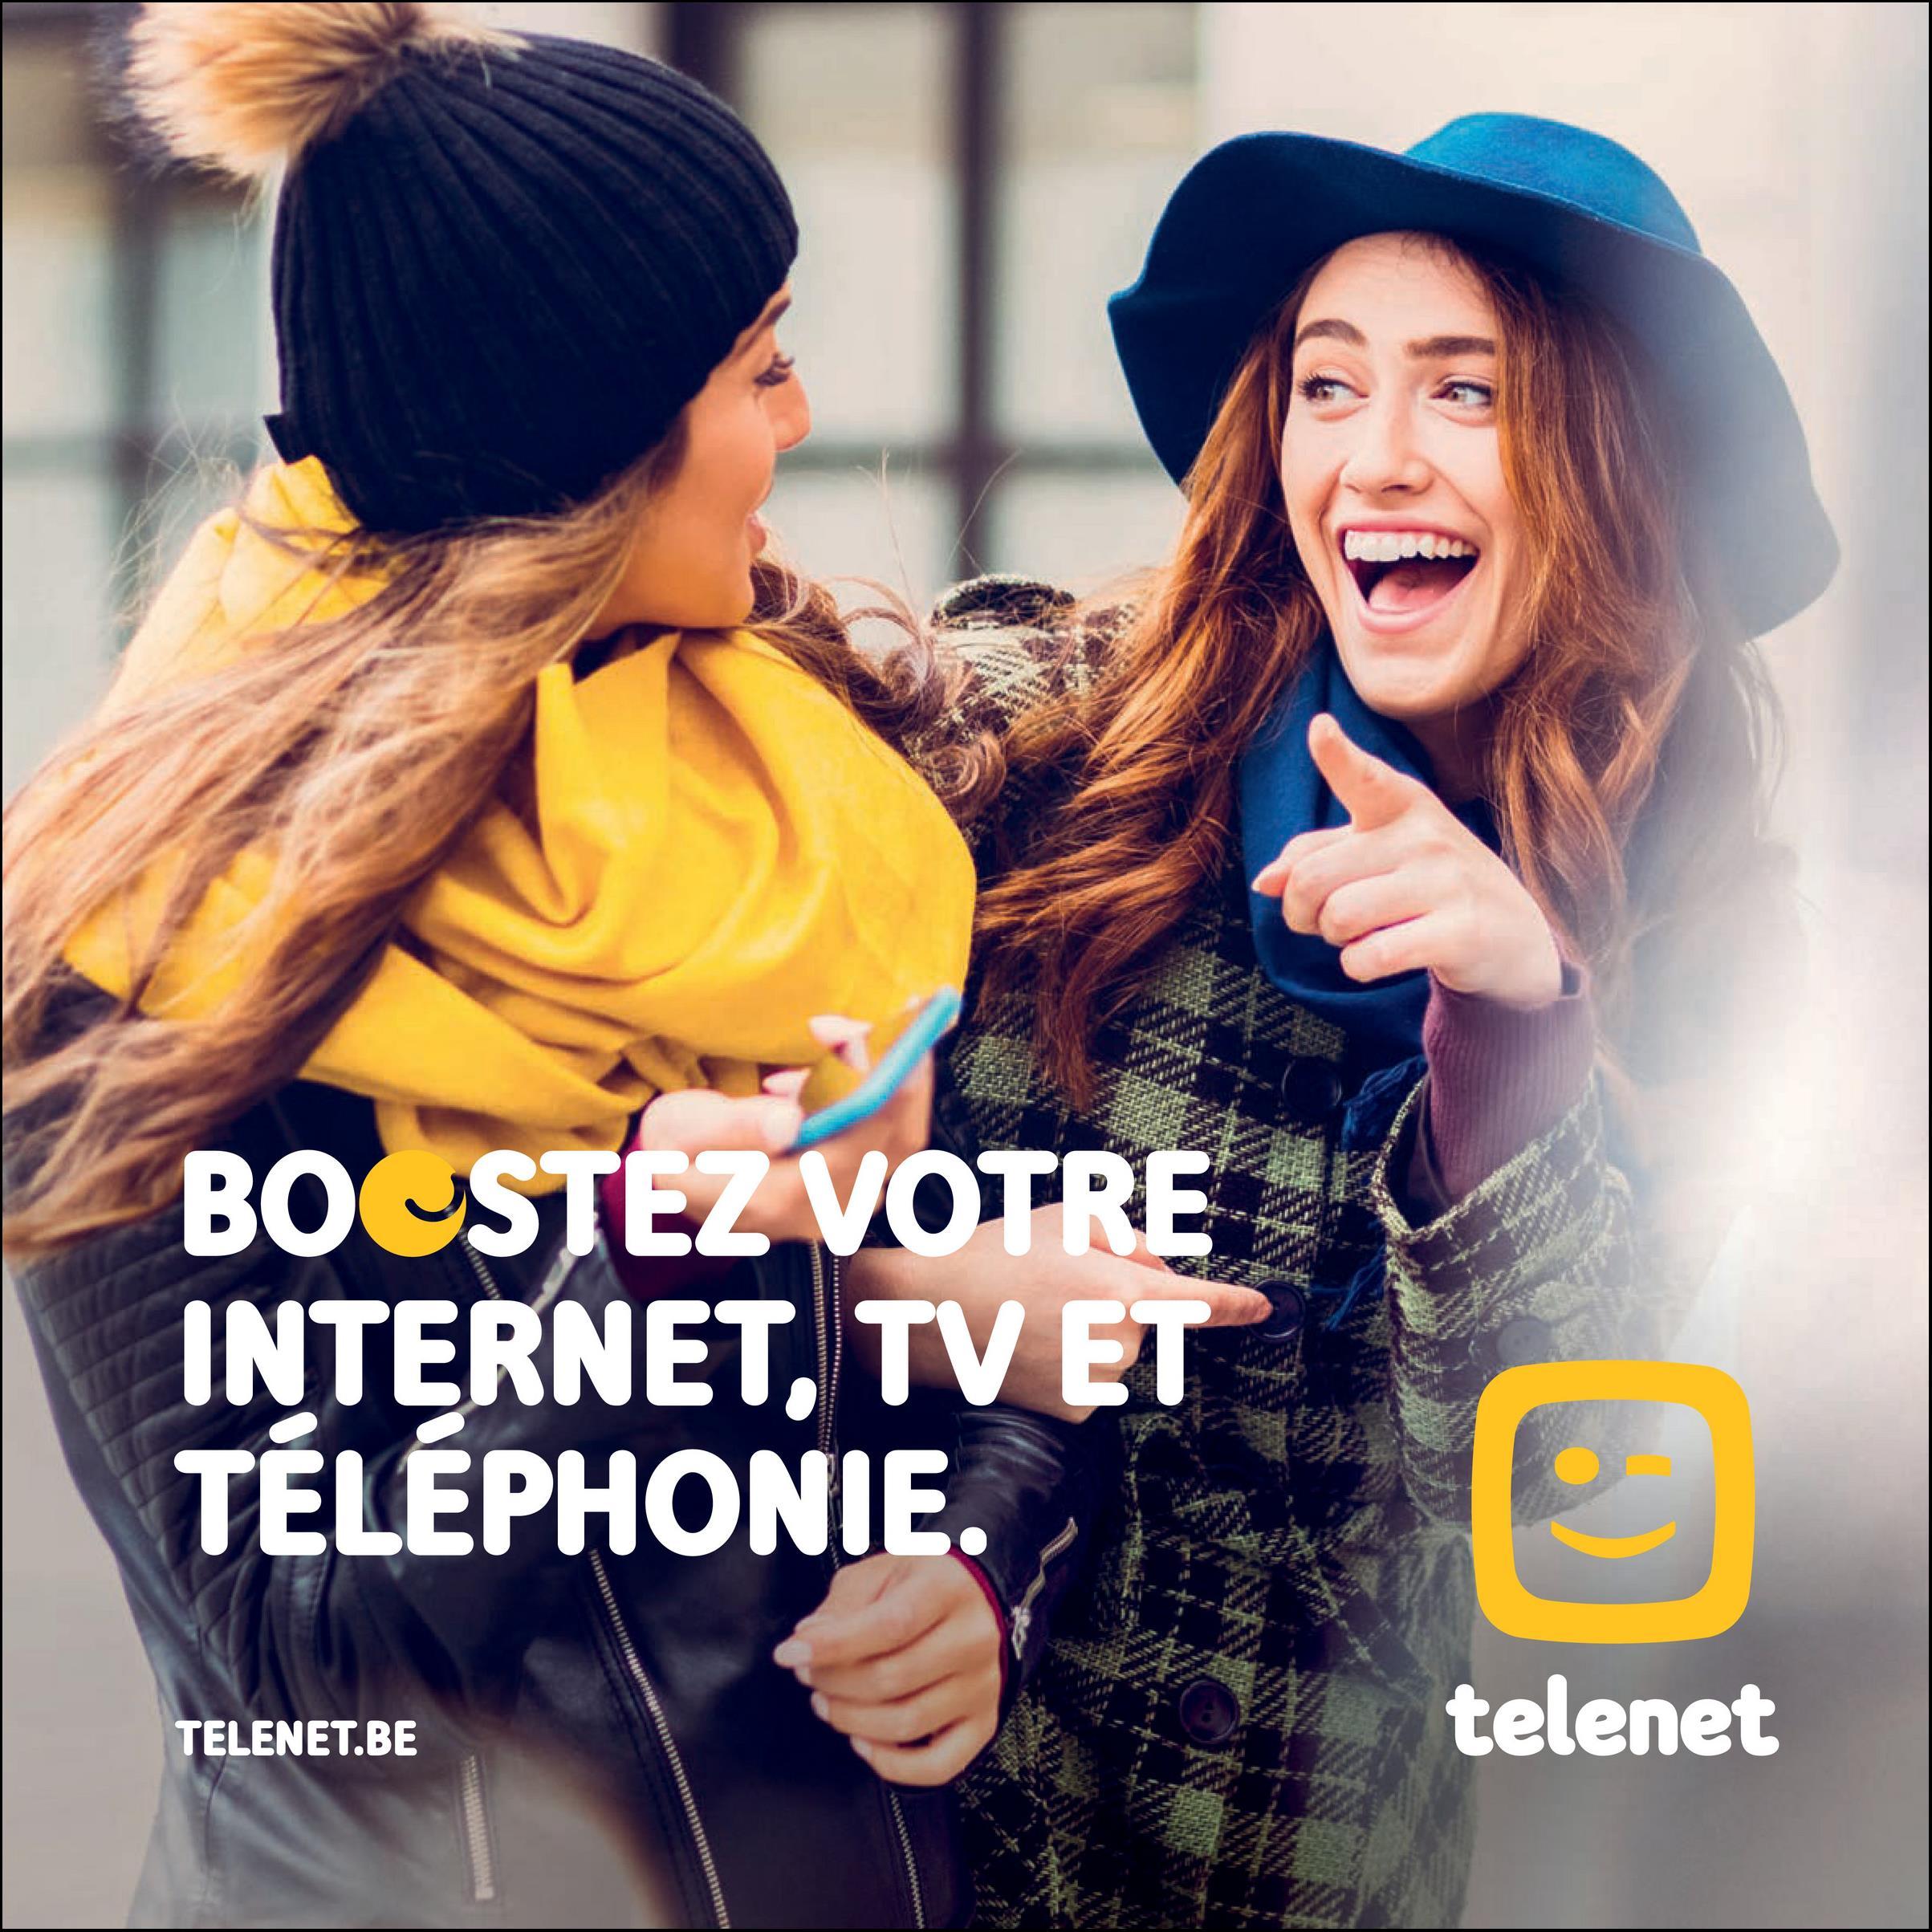 BOOSTEZ VOTRE INTERNET, TV ET TÉLÉPHONIE. 111111111111 113911744 TELENET.BE telenet